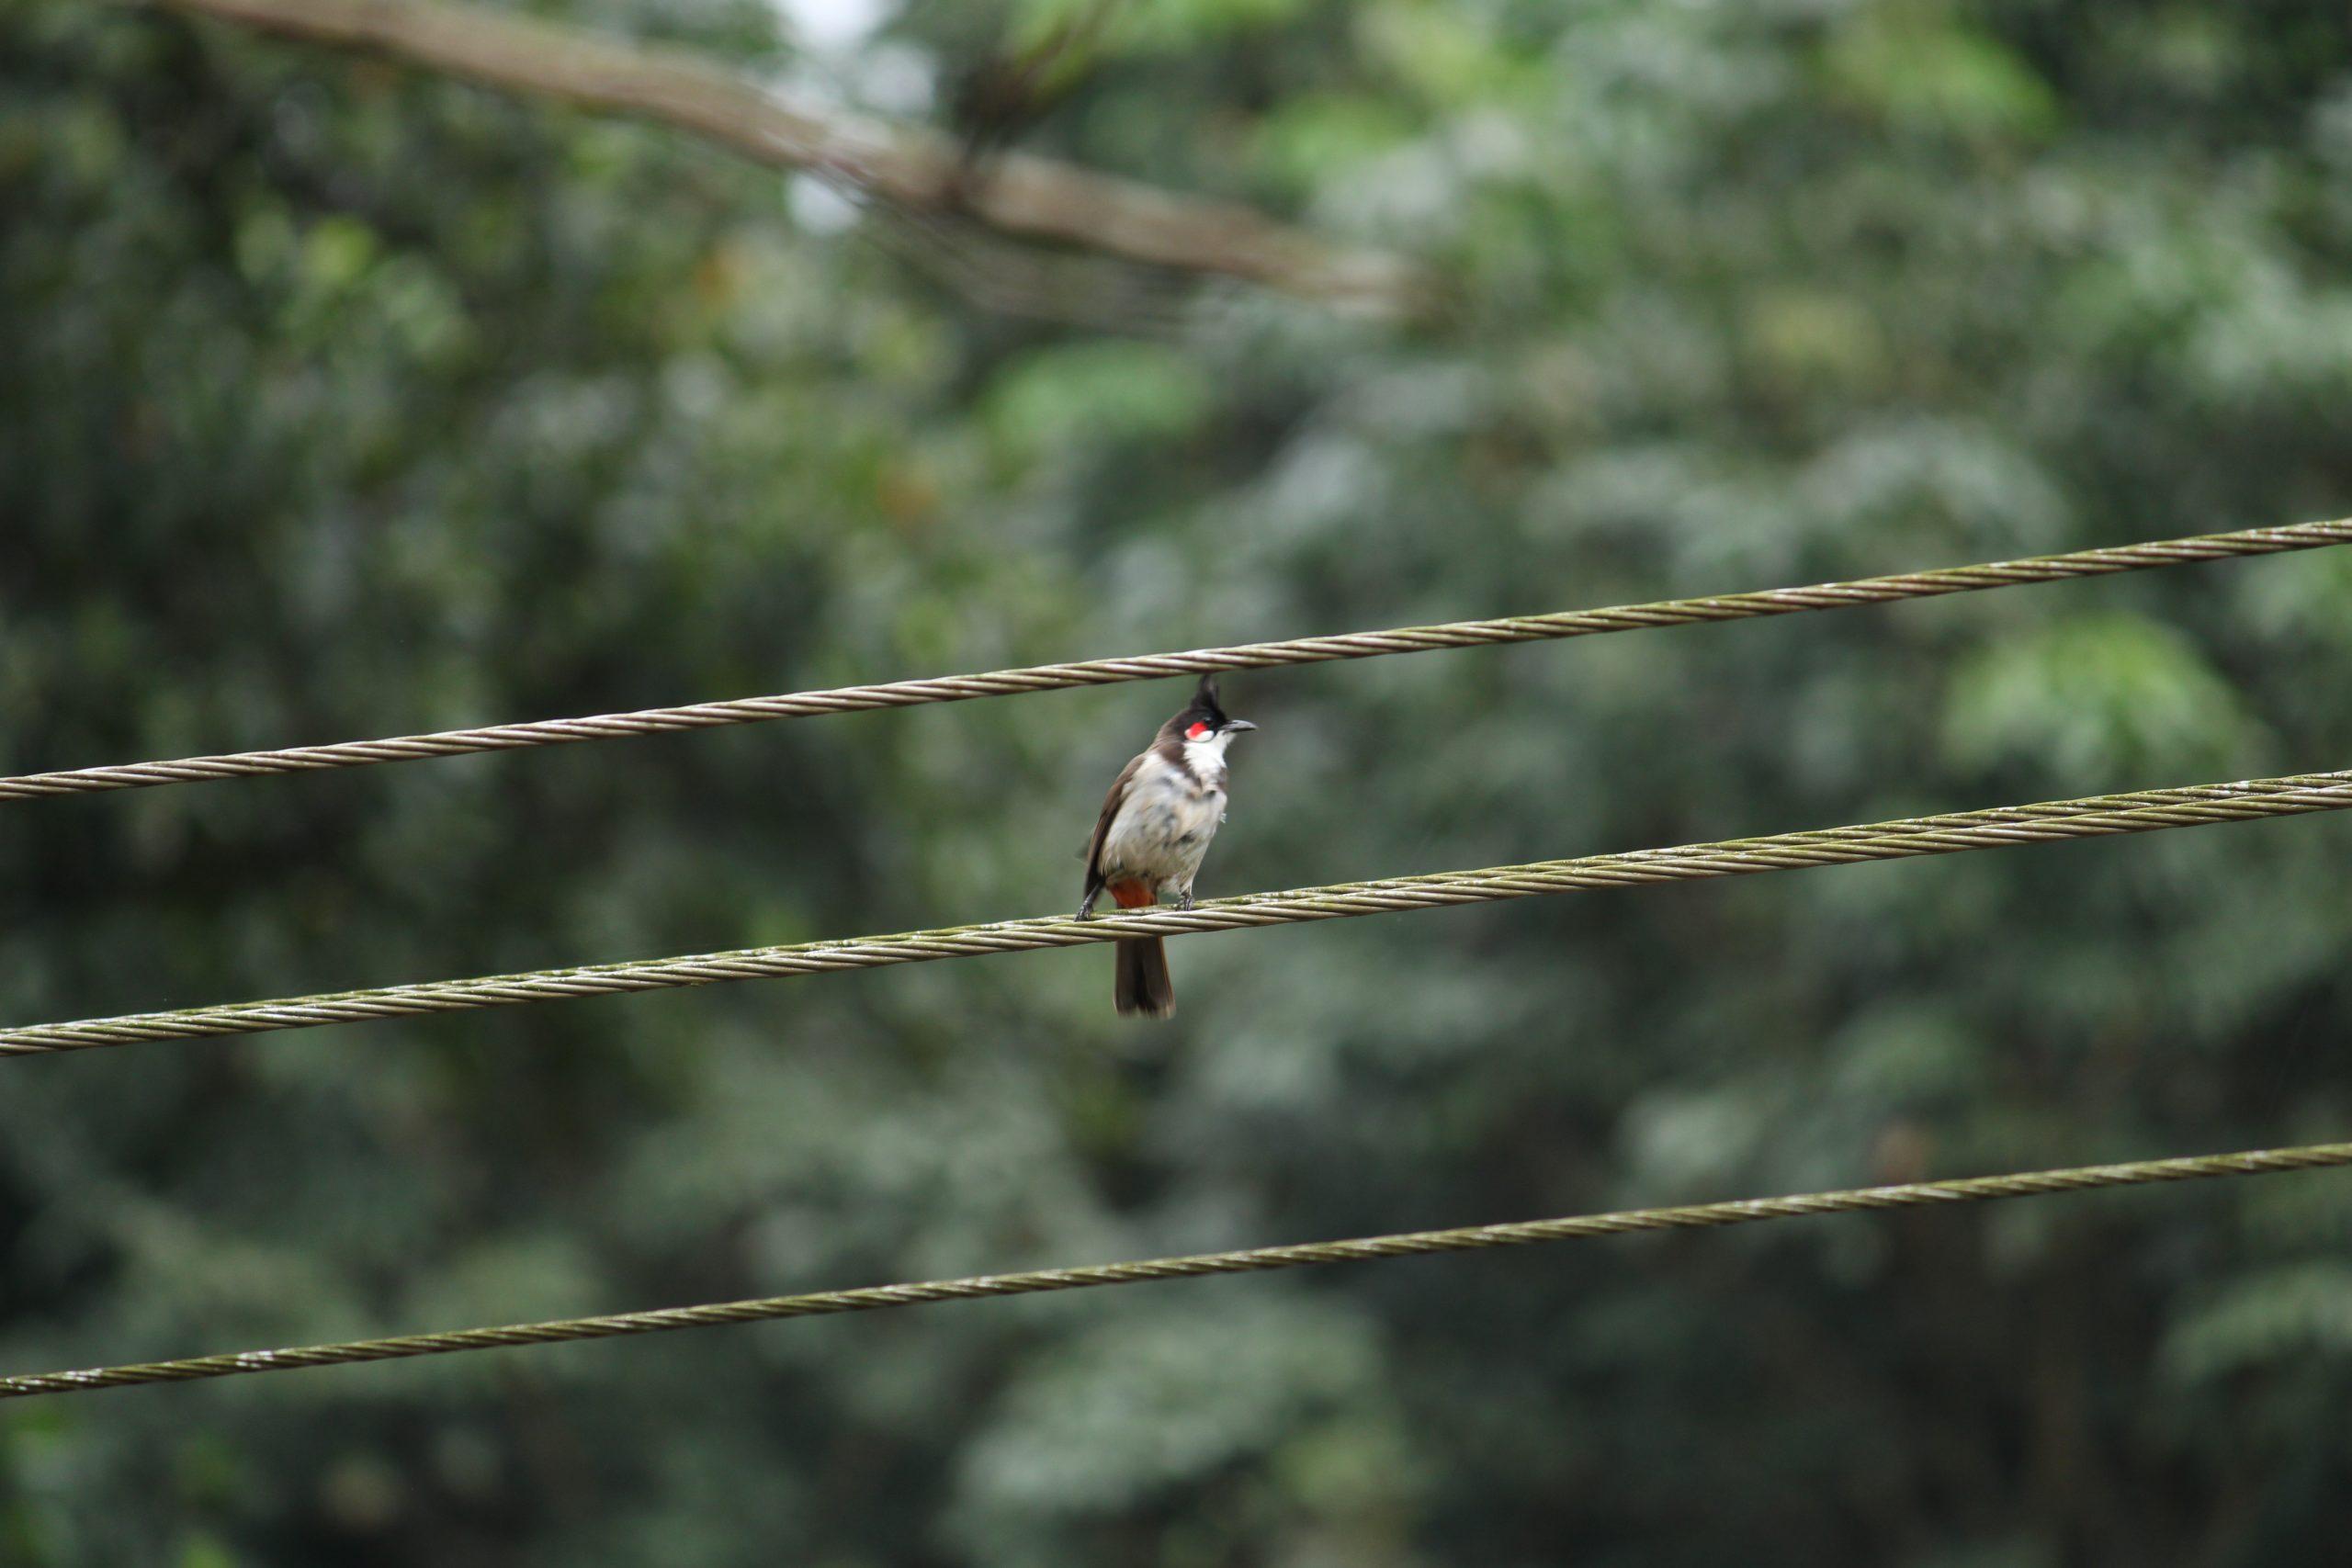 A bird on an electric line